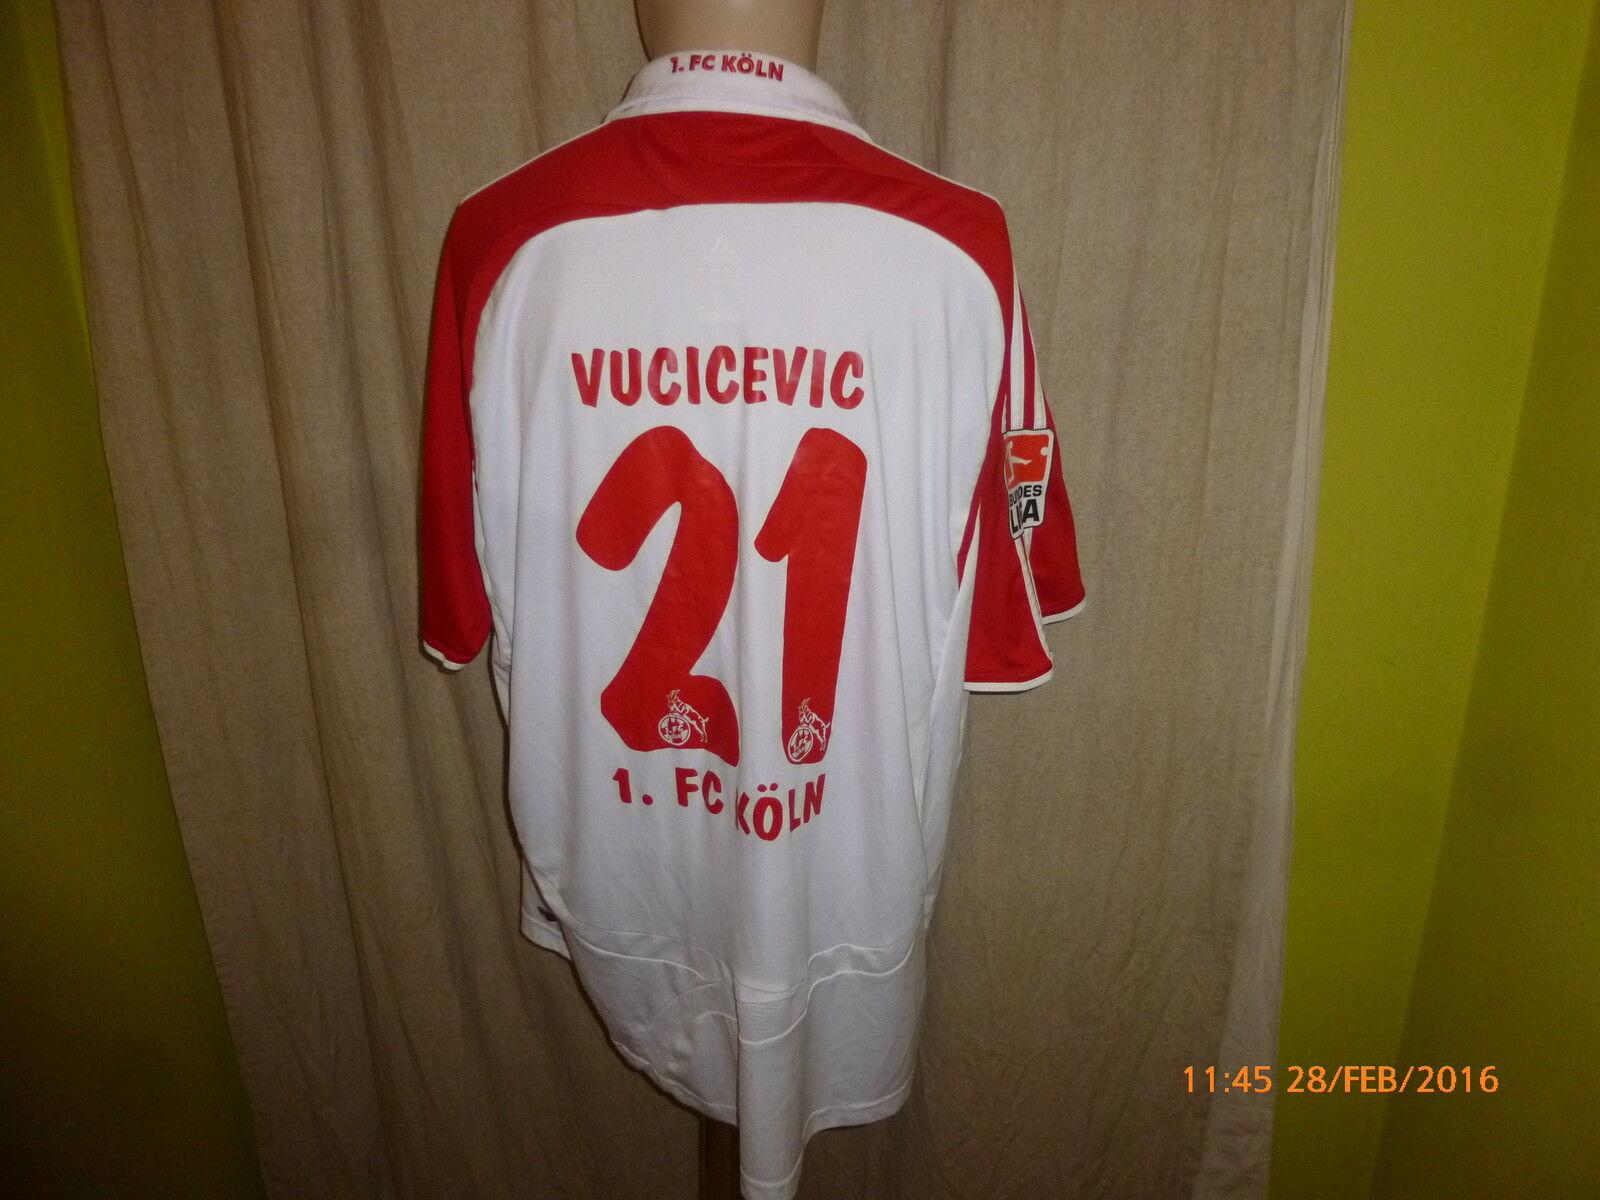 1.FC Köln Köln Köln Adidas Heim Trikot 2007 08  REWE  + Nr.21 Vucicevic Gr.XL- XXL TOP e4c648